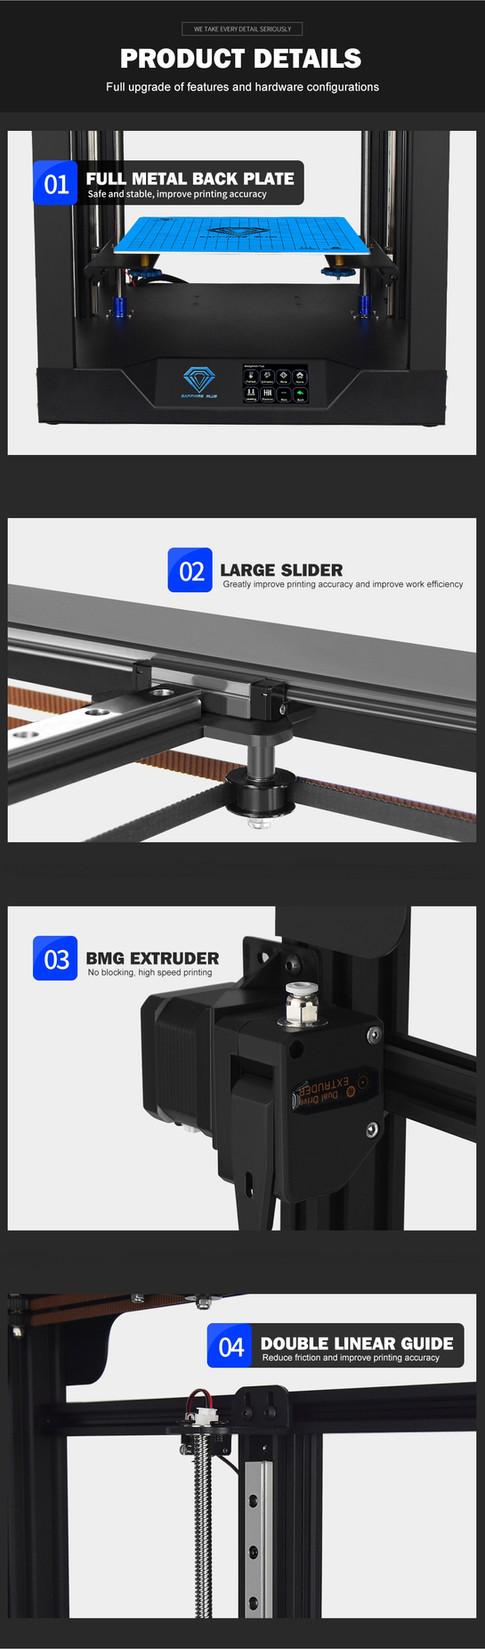 Impresora 3D TwoTrees Sapphire Plus V1.1 - Digitalz 3D Perú 25.jpg